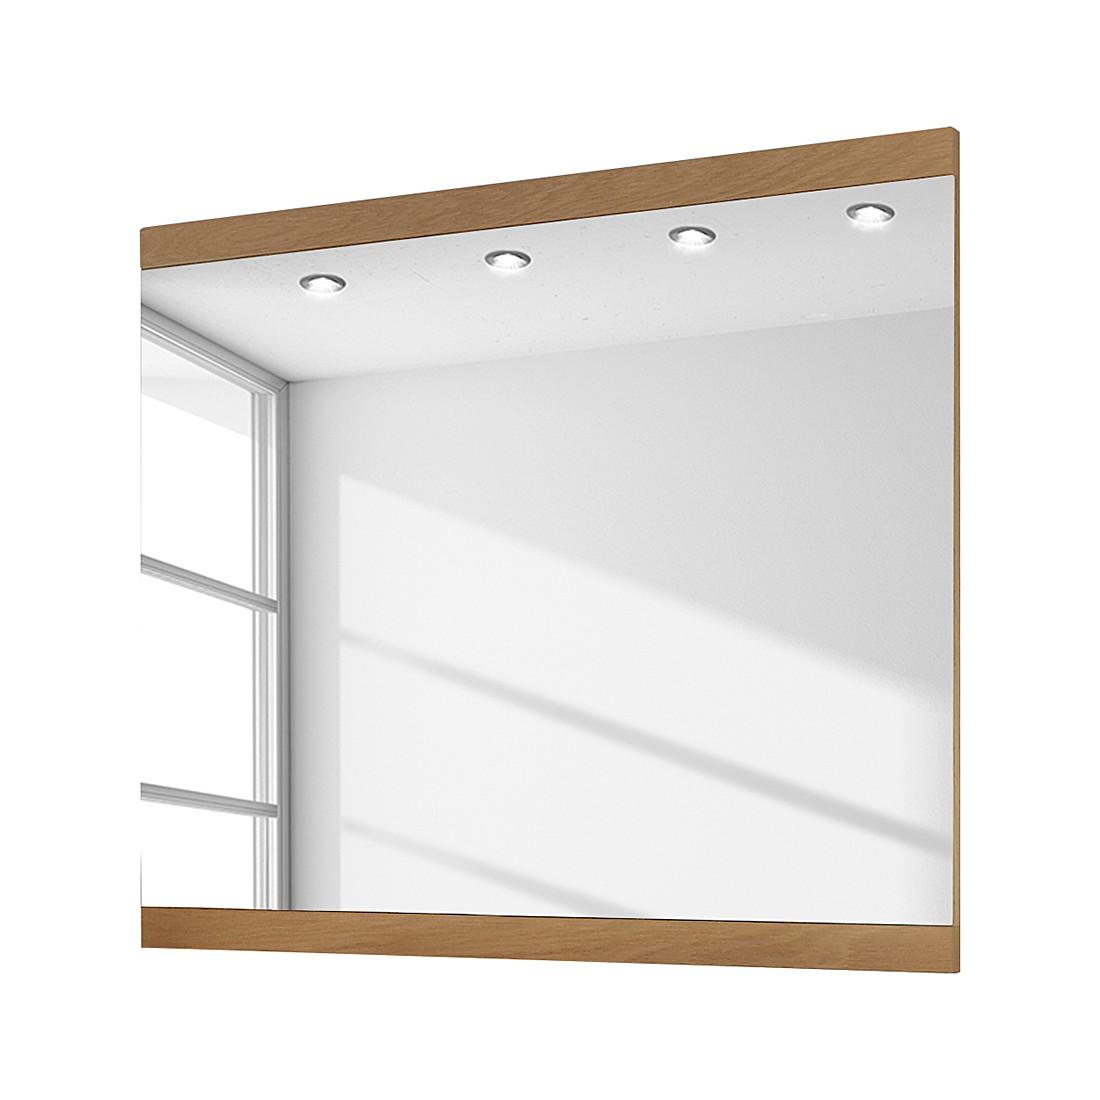 Miroir Allround II - Chêne sauvage brut de sciage - 82 x 80 cm, Voss